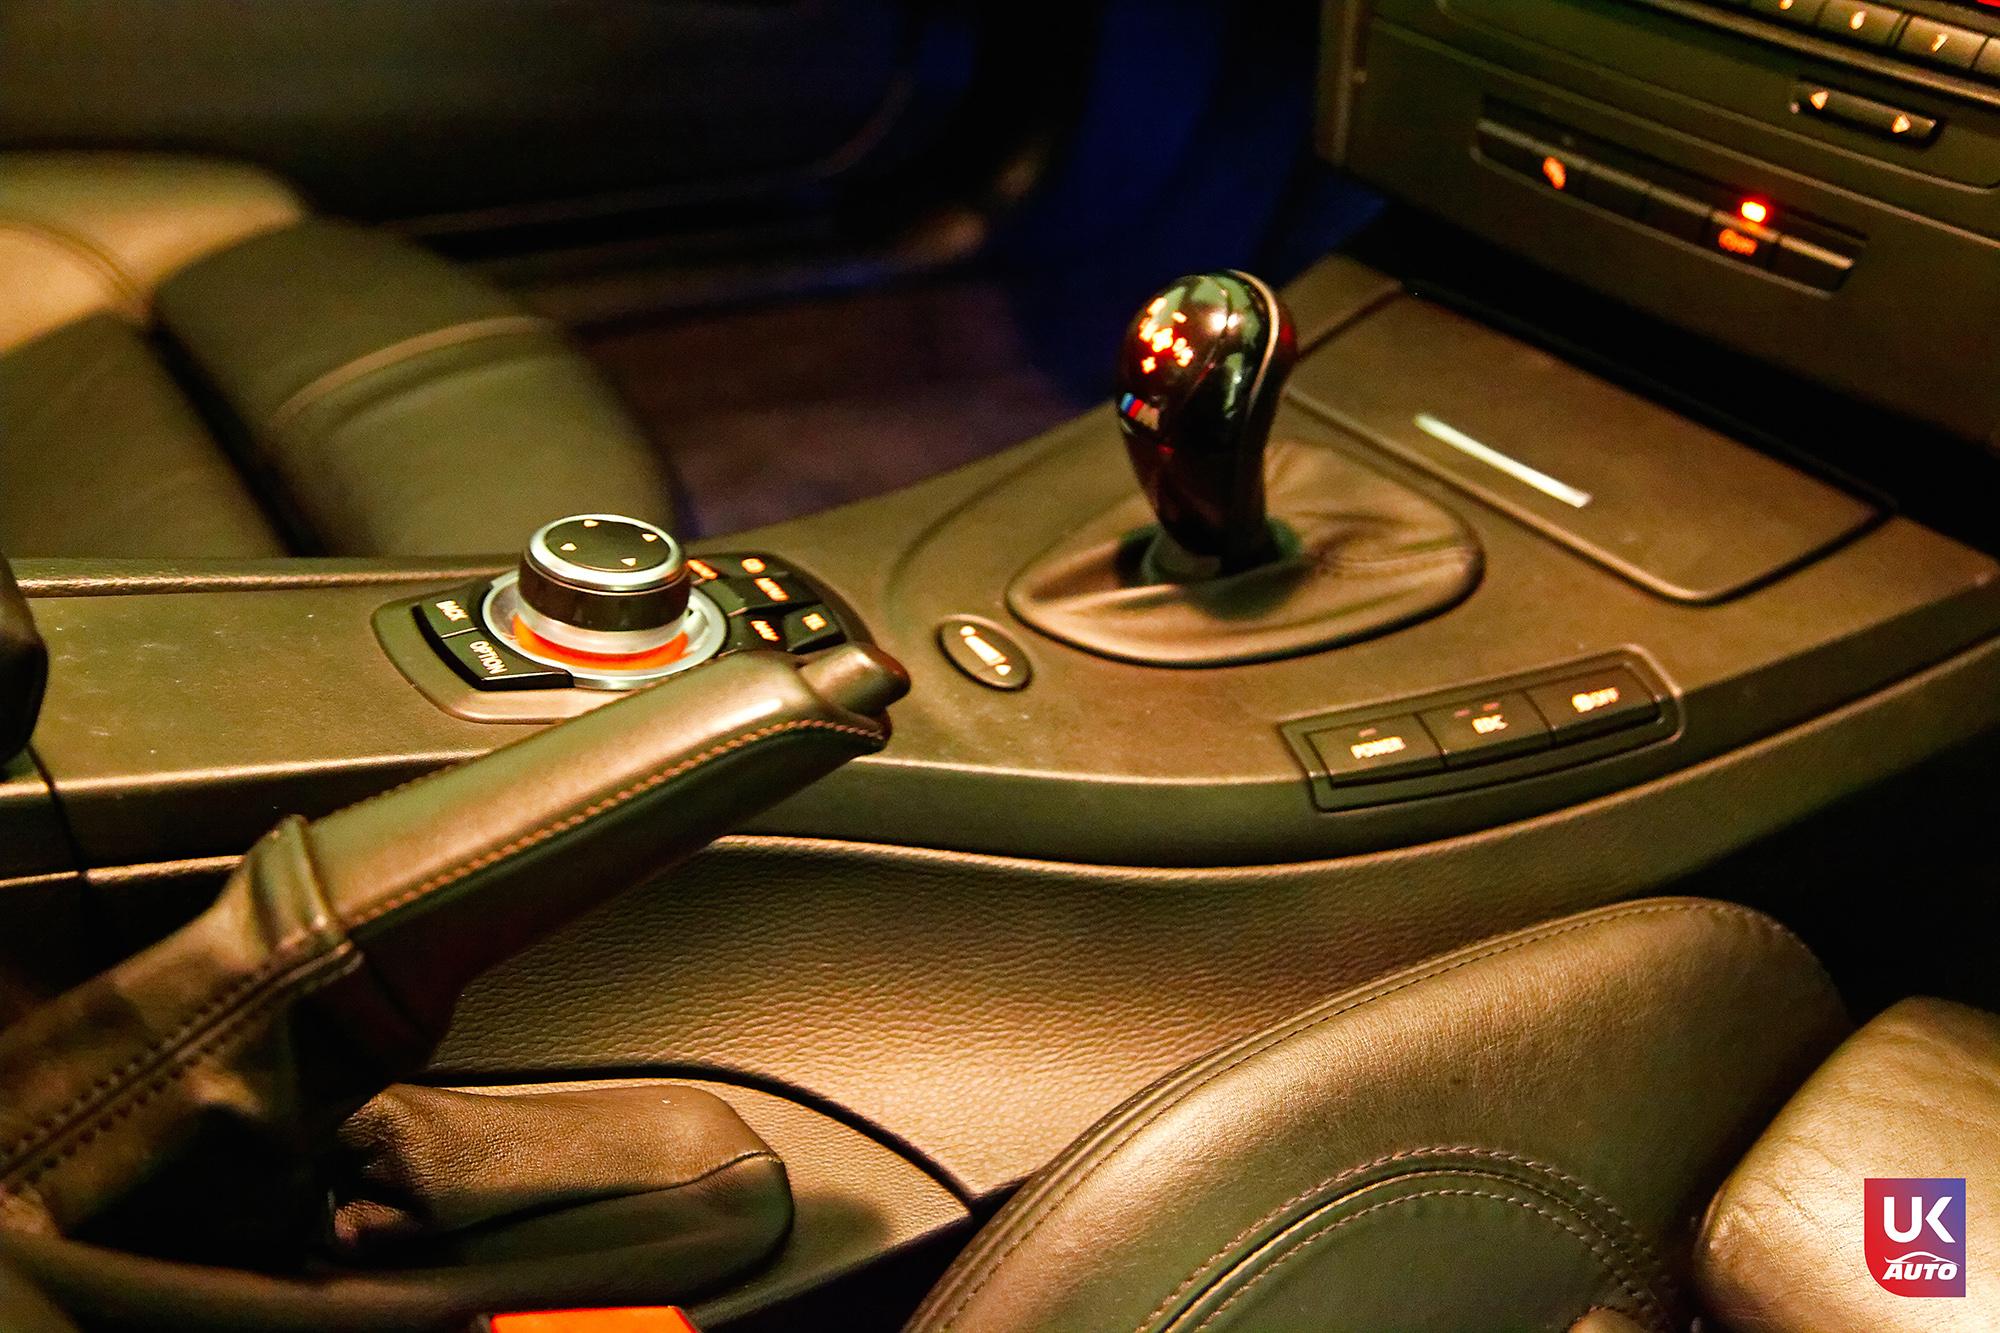 BMW m3 E92 import auto mandataire angleterre uk londres bmw leboncoin achat angleterre bmw voiture anglaise auto rhd e92 uk auto5 - Felecitation a Clement pour cette BMW M3 E92 COUPE RHD PACK CARBON BMW ANGLETERRE VOITURE UK